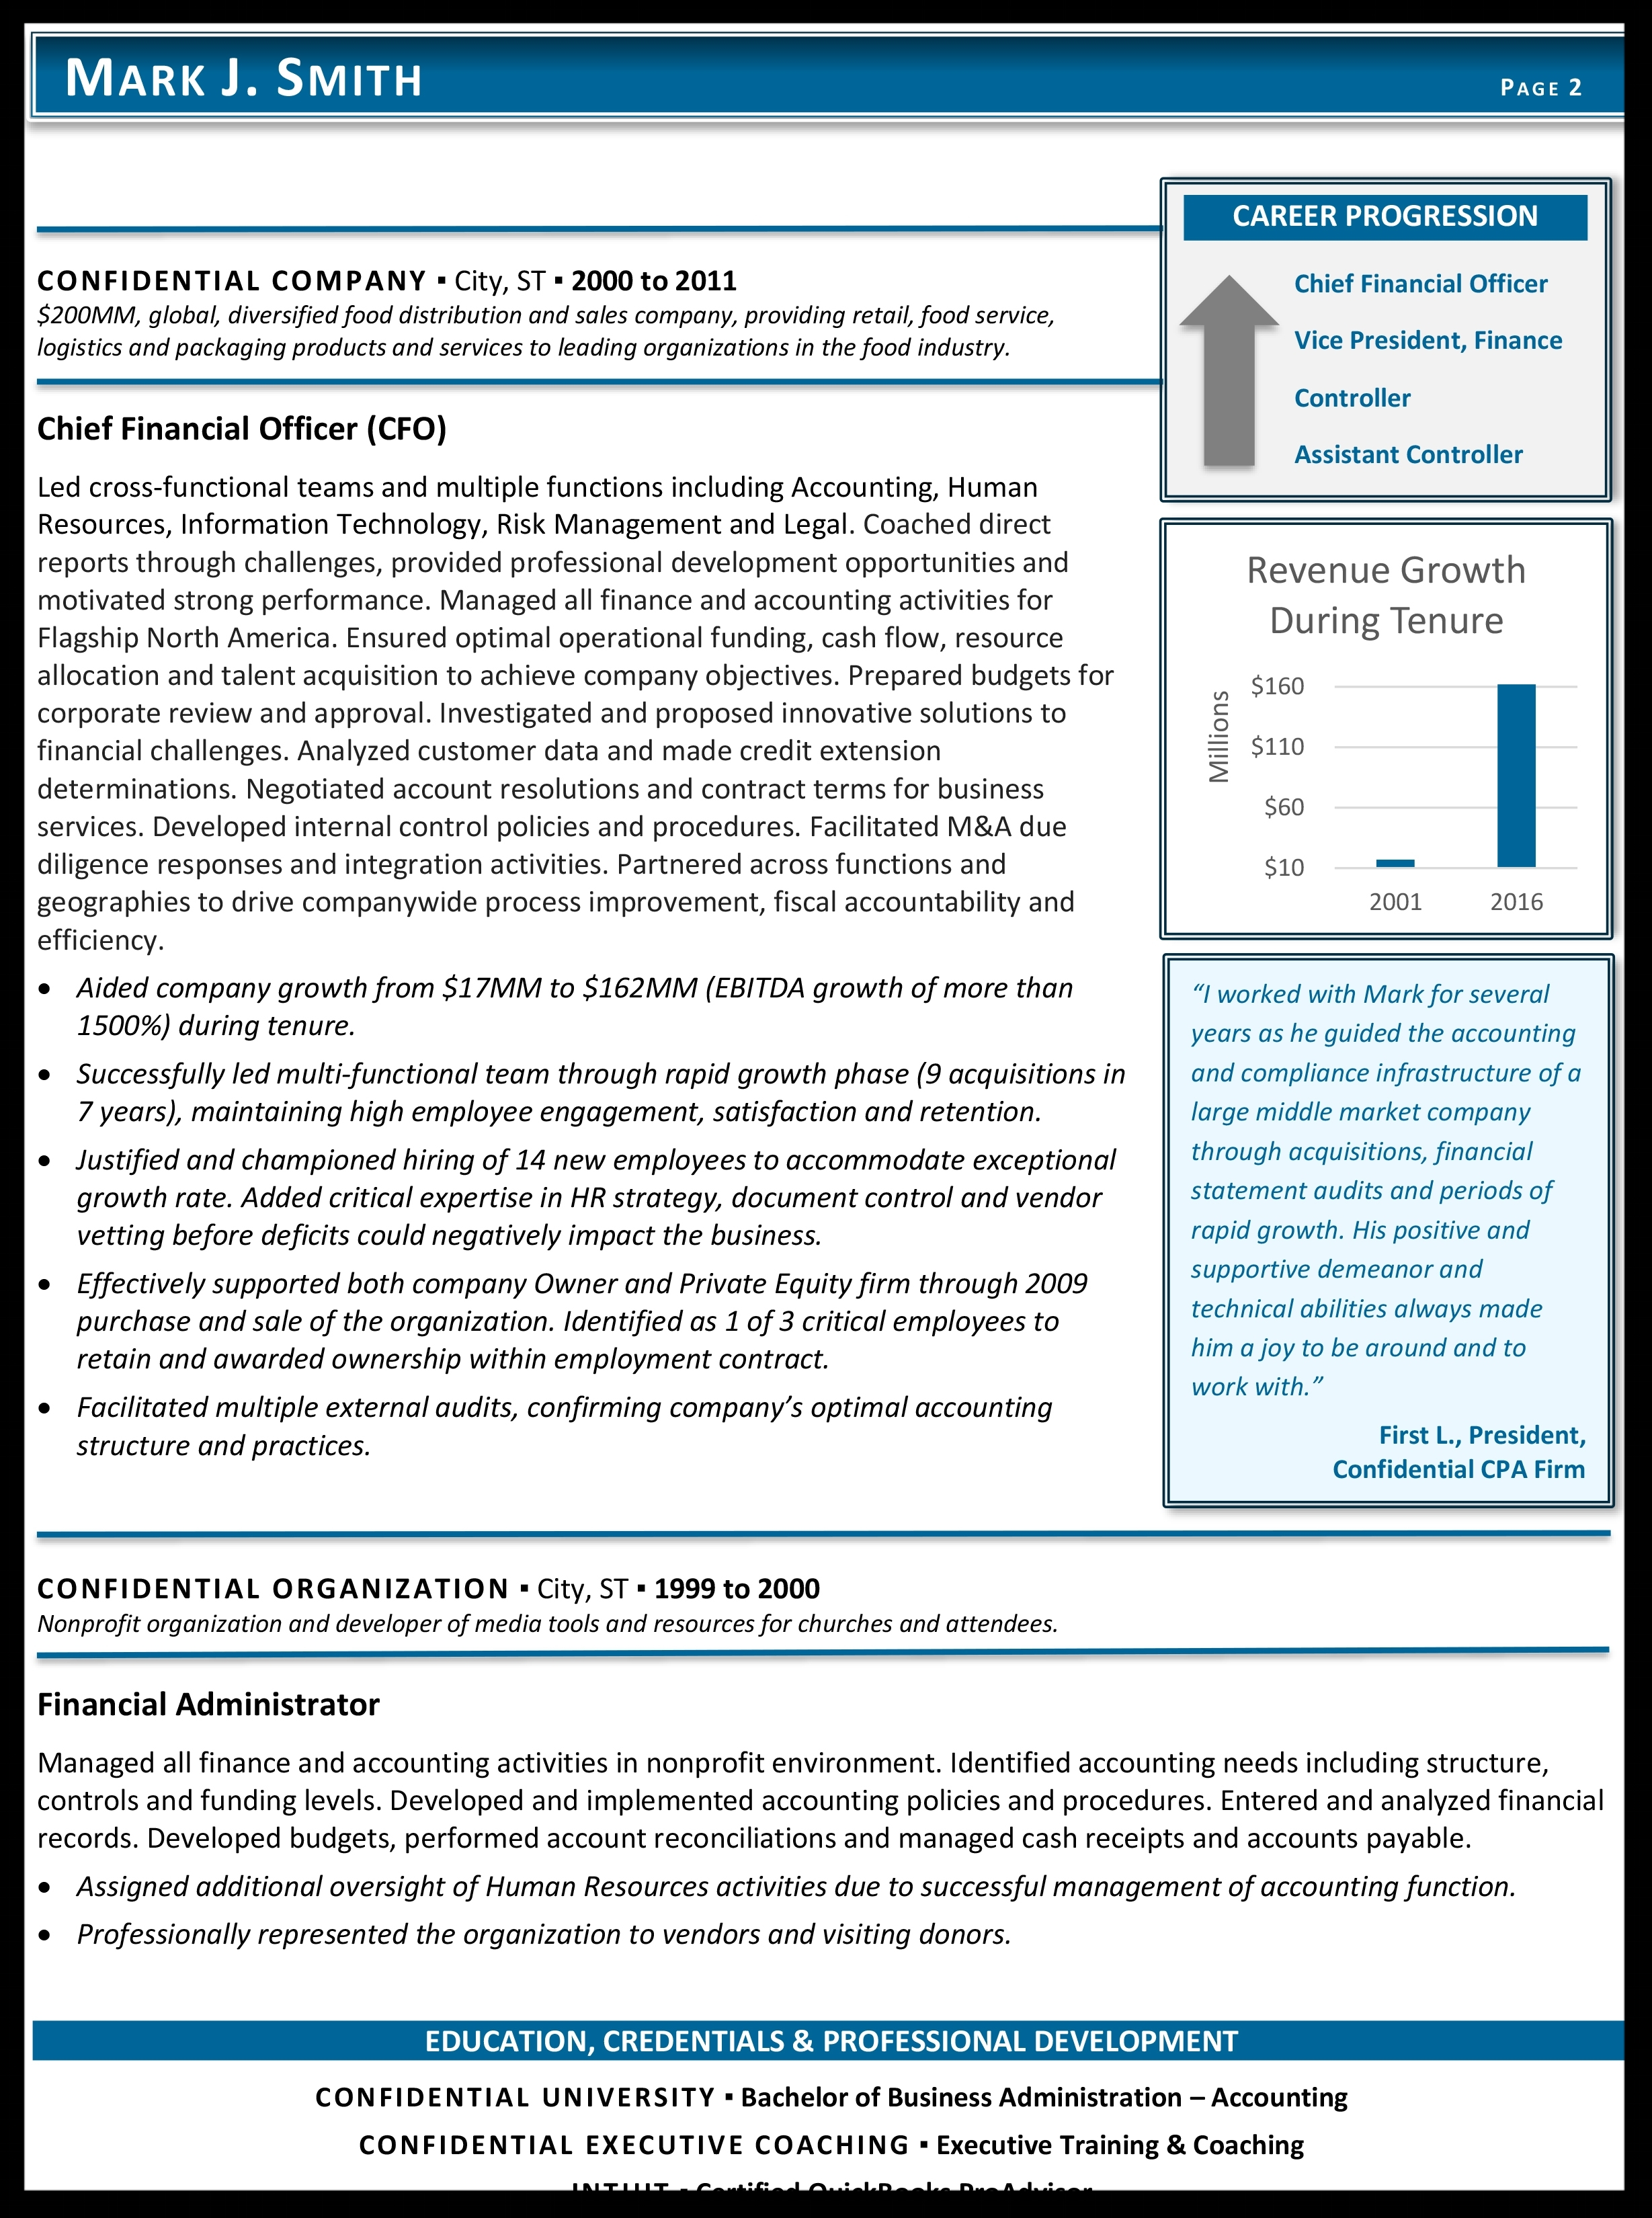 Sample CFO Resume Page 2.jpg